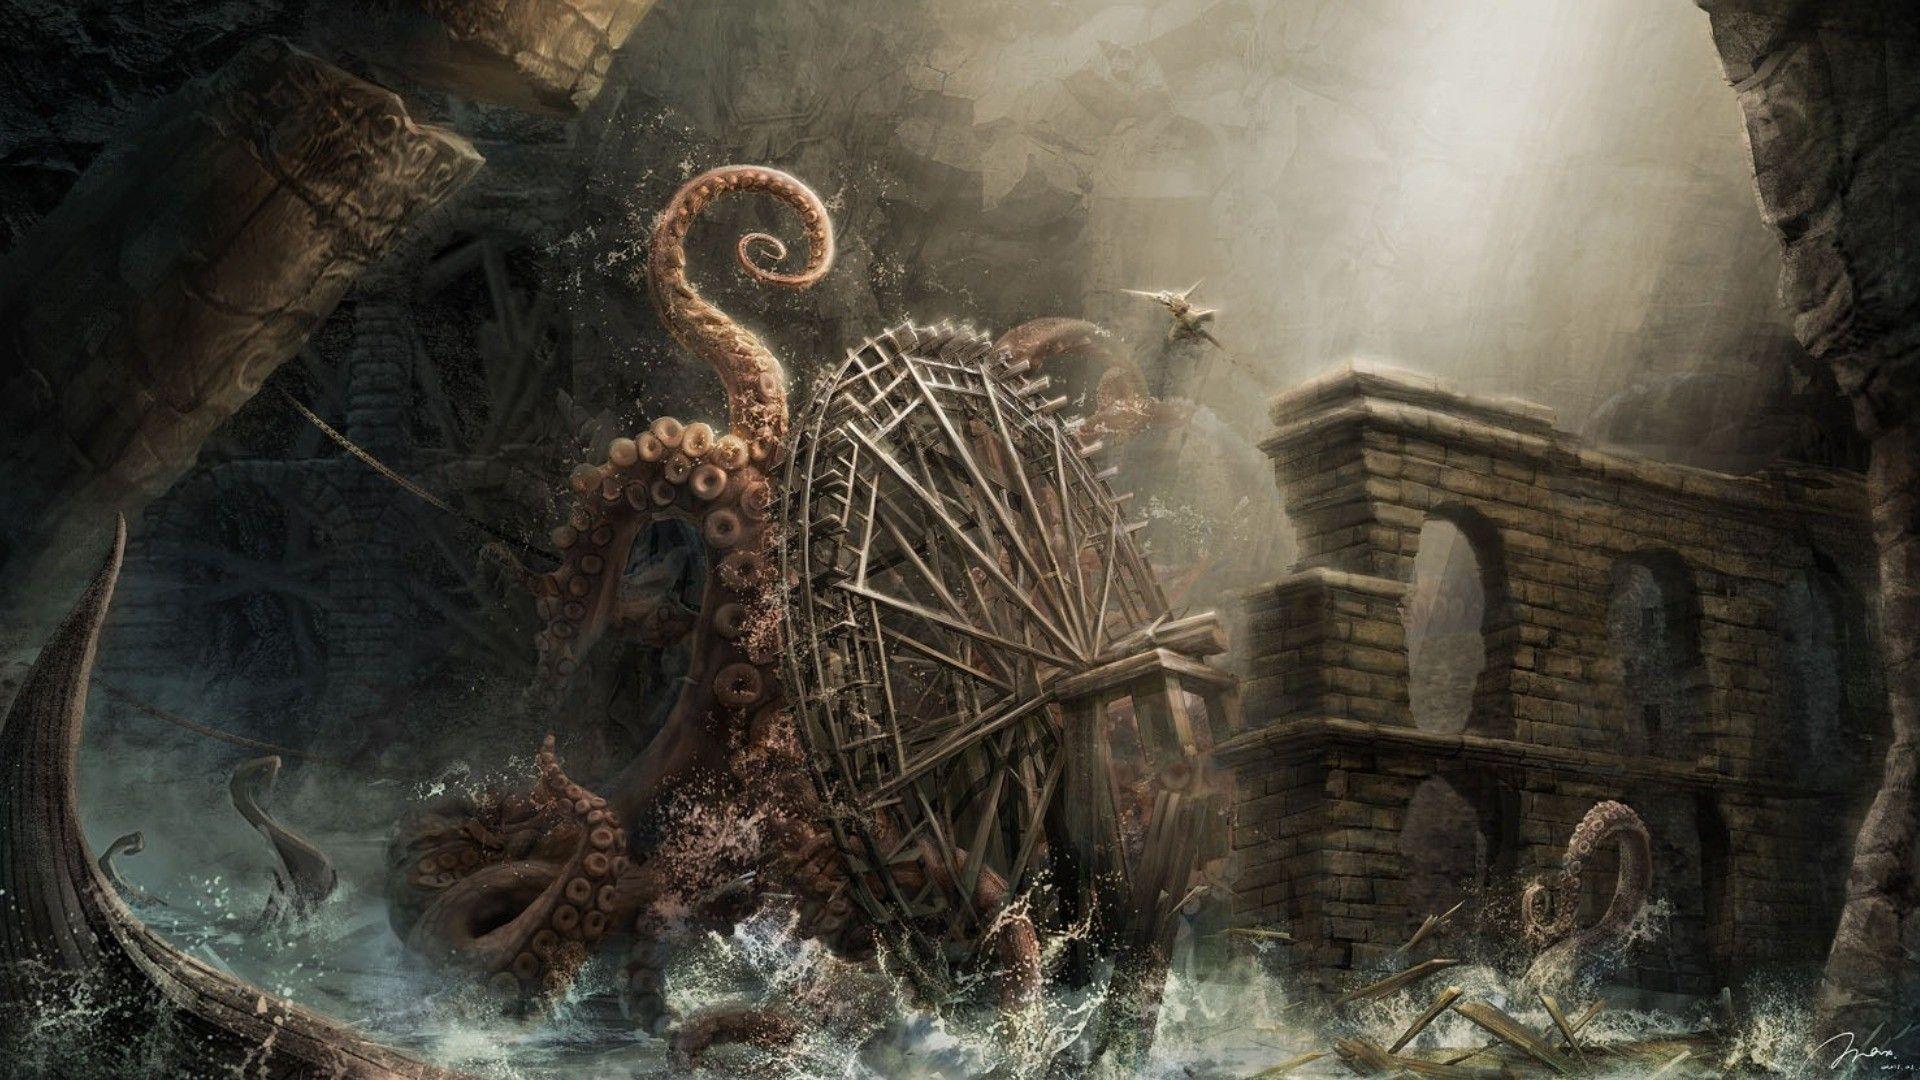 Mill Octopus Wallpaper No 184432 Kraken Octopus Pictures Mythical Creatures